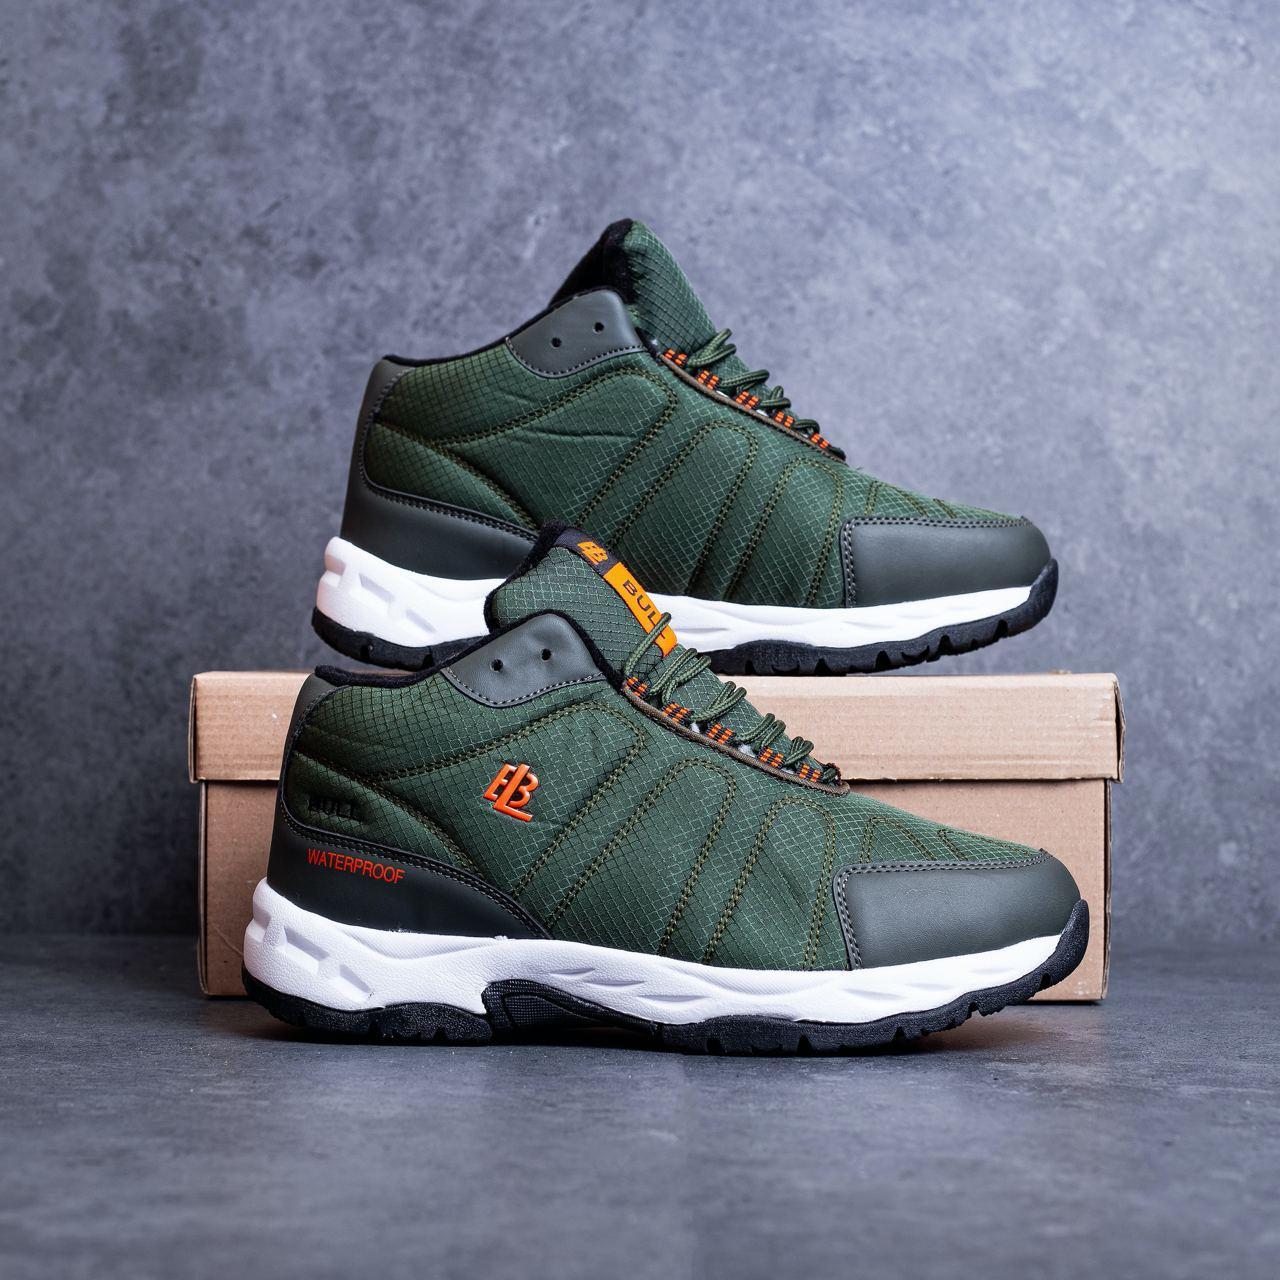 Мужские ботинки Булл Ватерпруф Pobedov (зеленые)